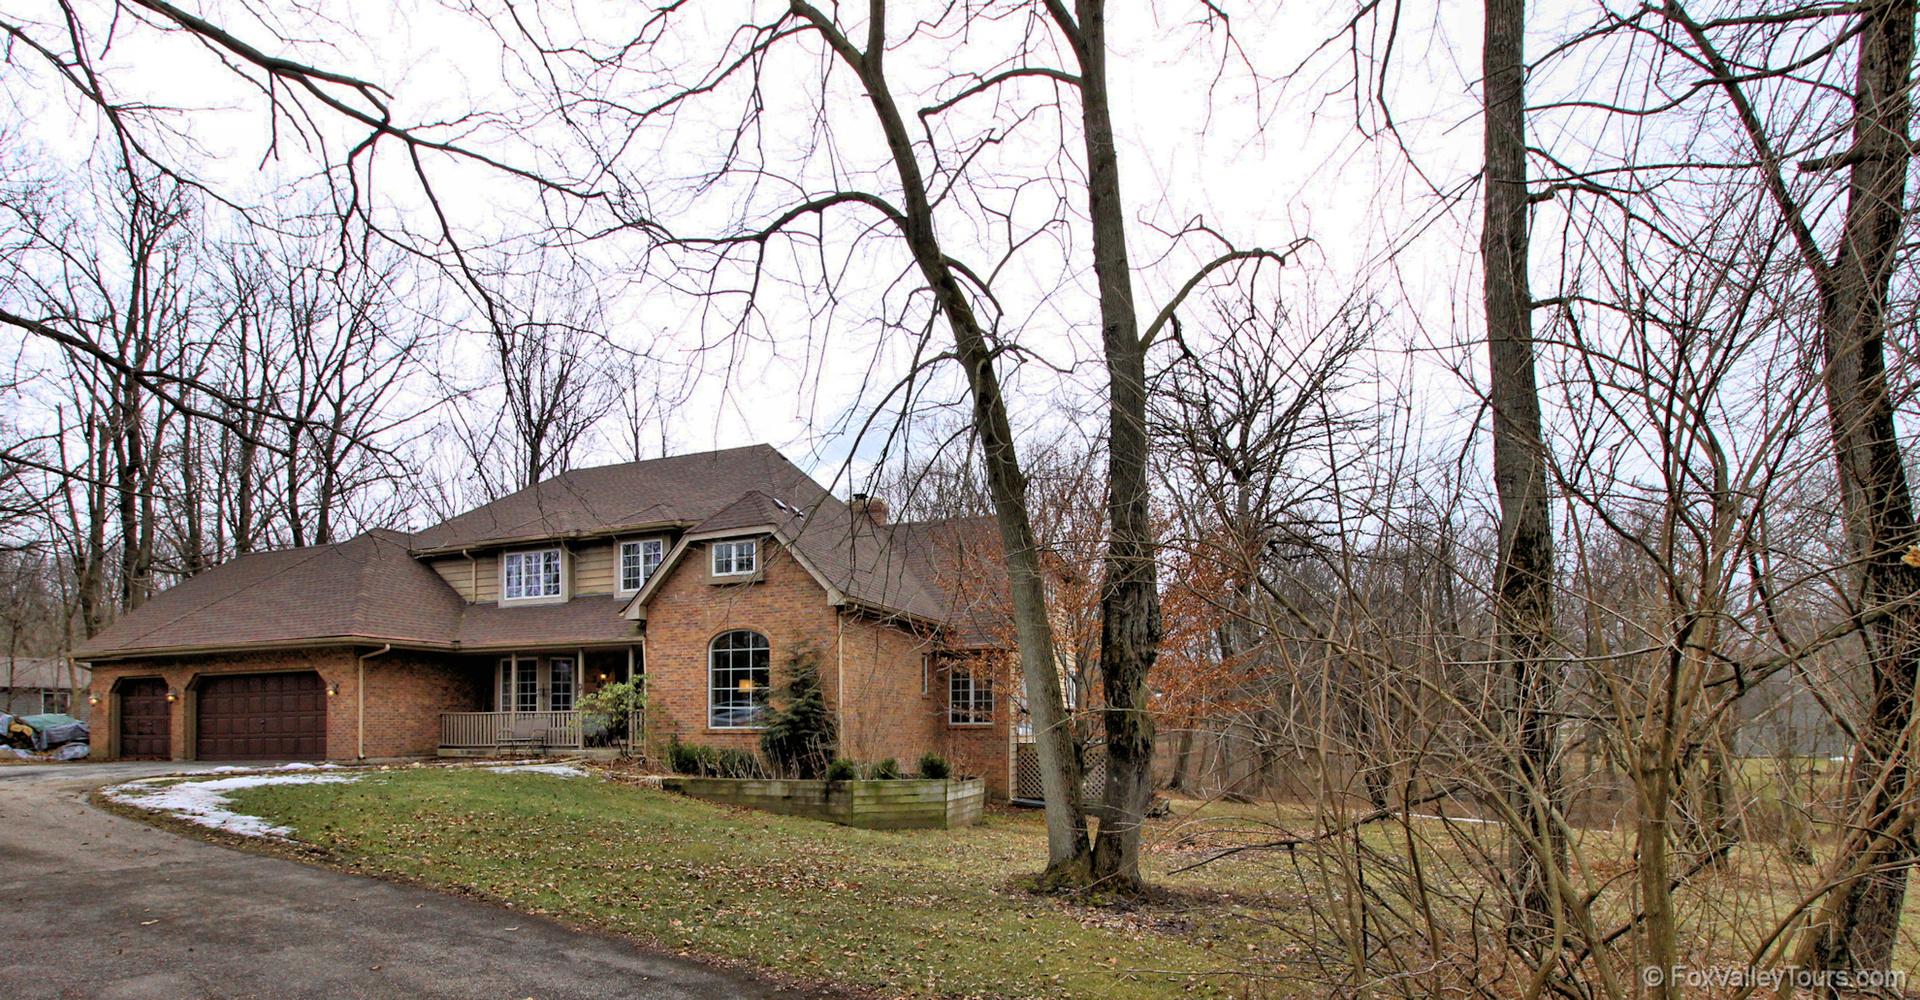 30 Crestview, Oswego, Illinois, 60543